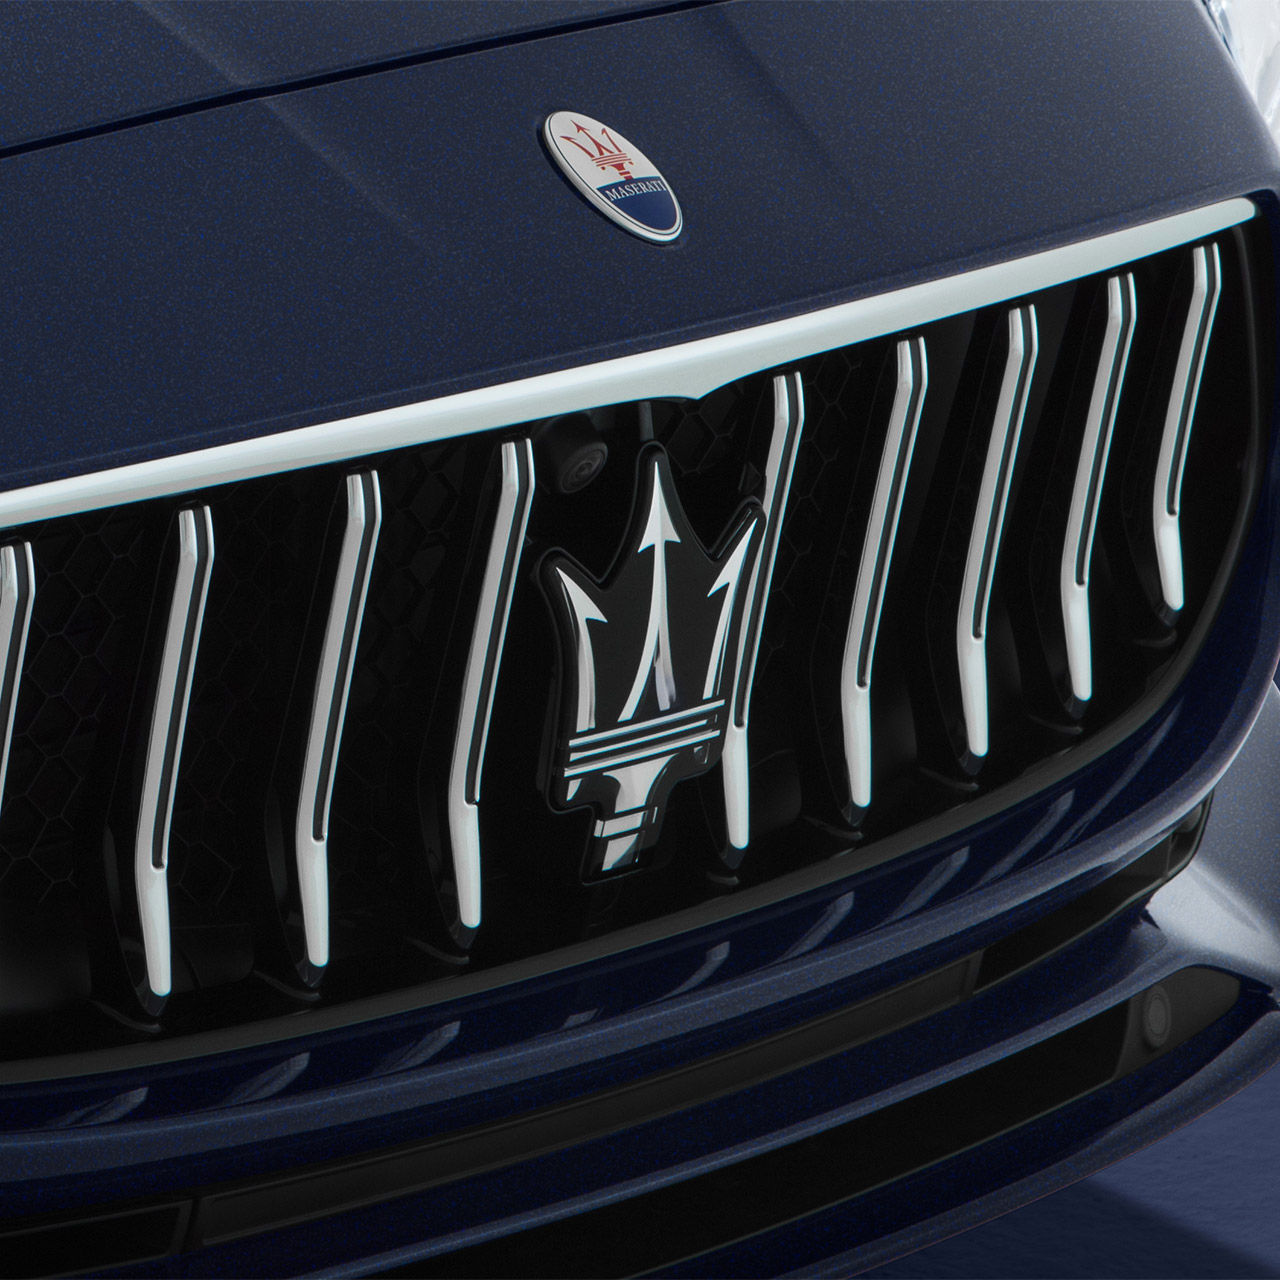 Maserati Quattroporte - Kühlergrill mit Maserati Logo